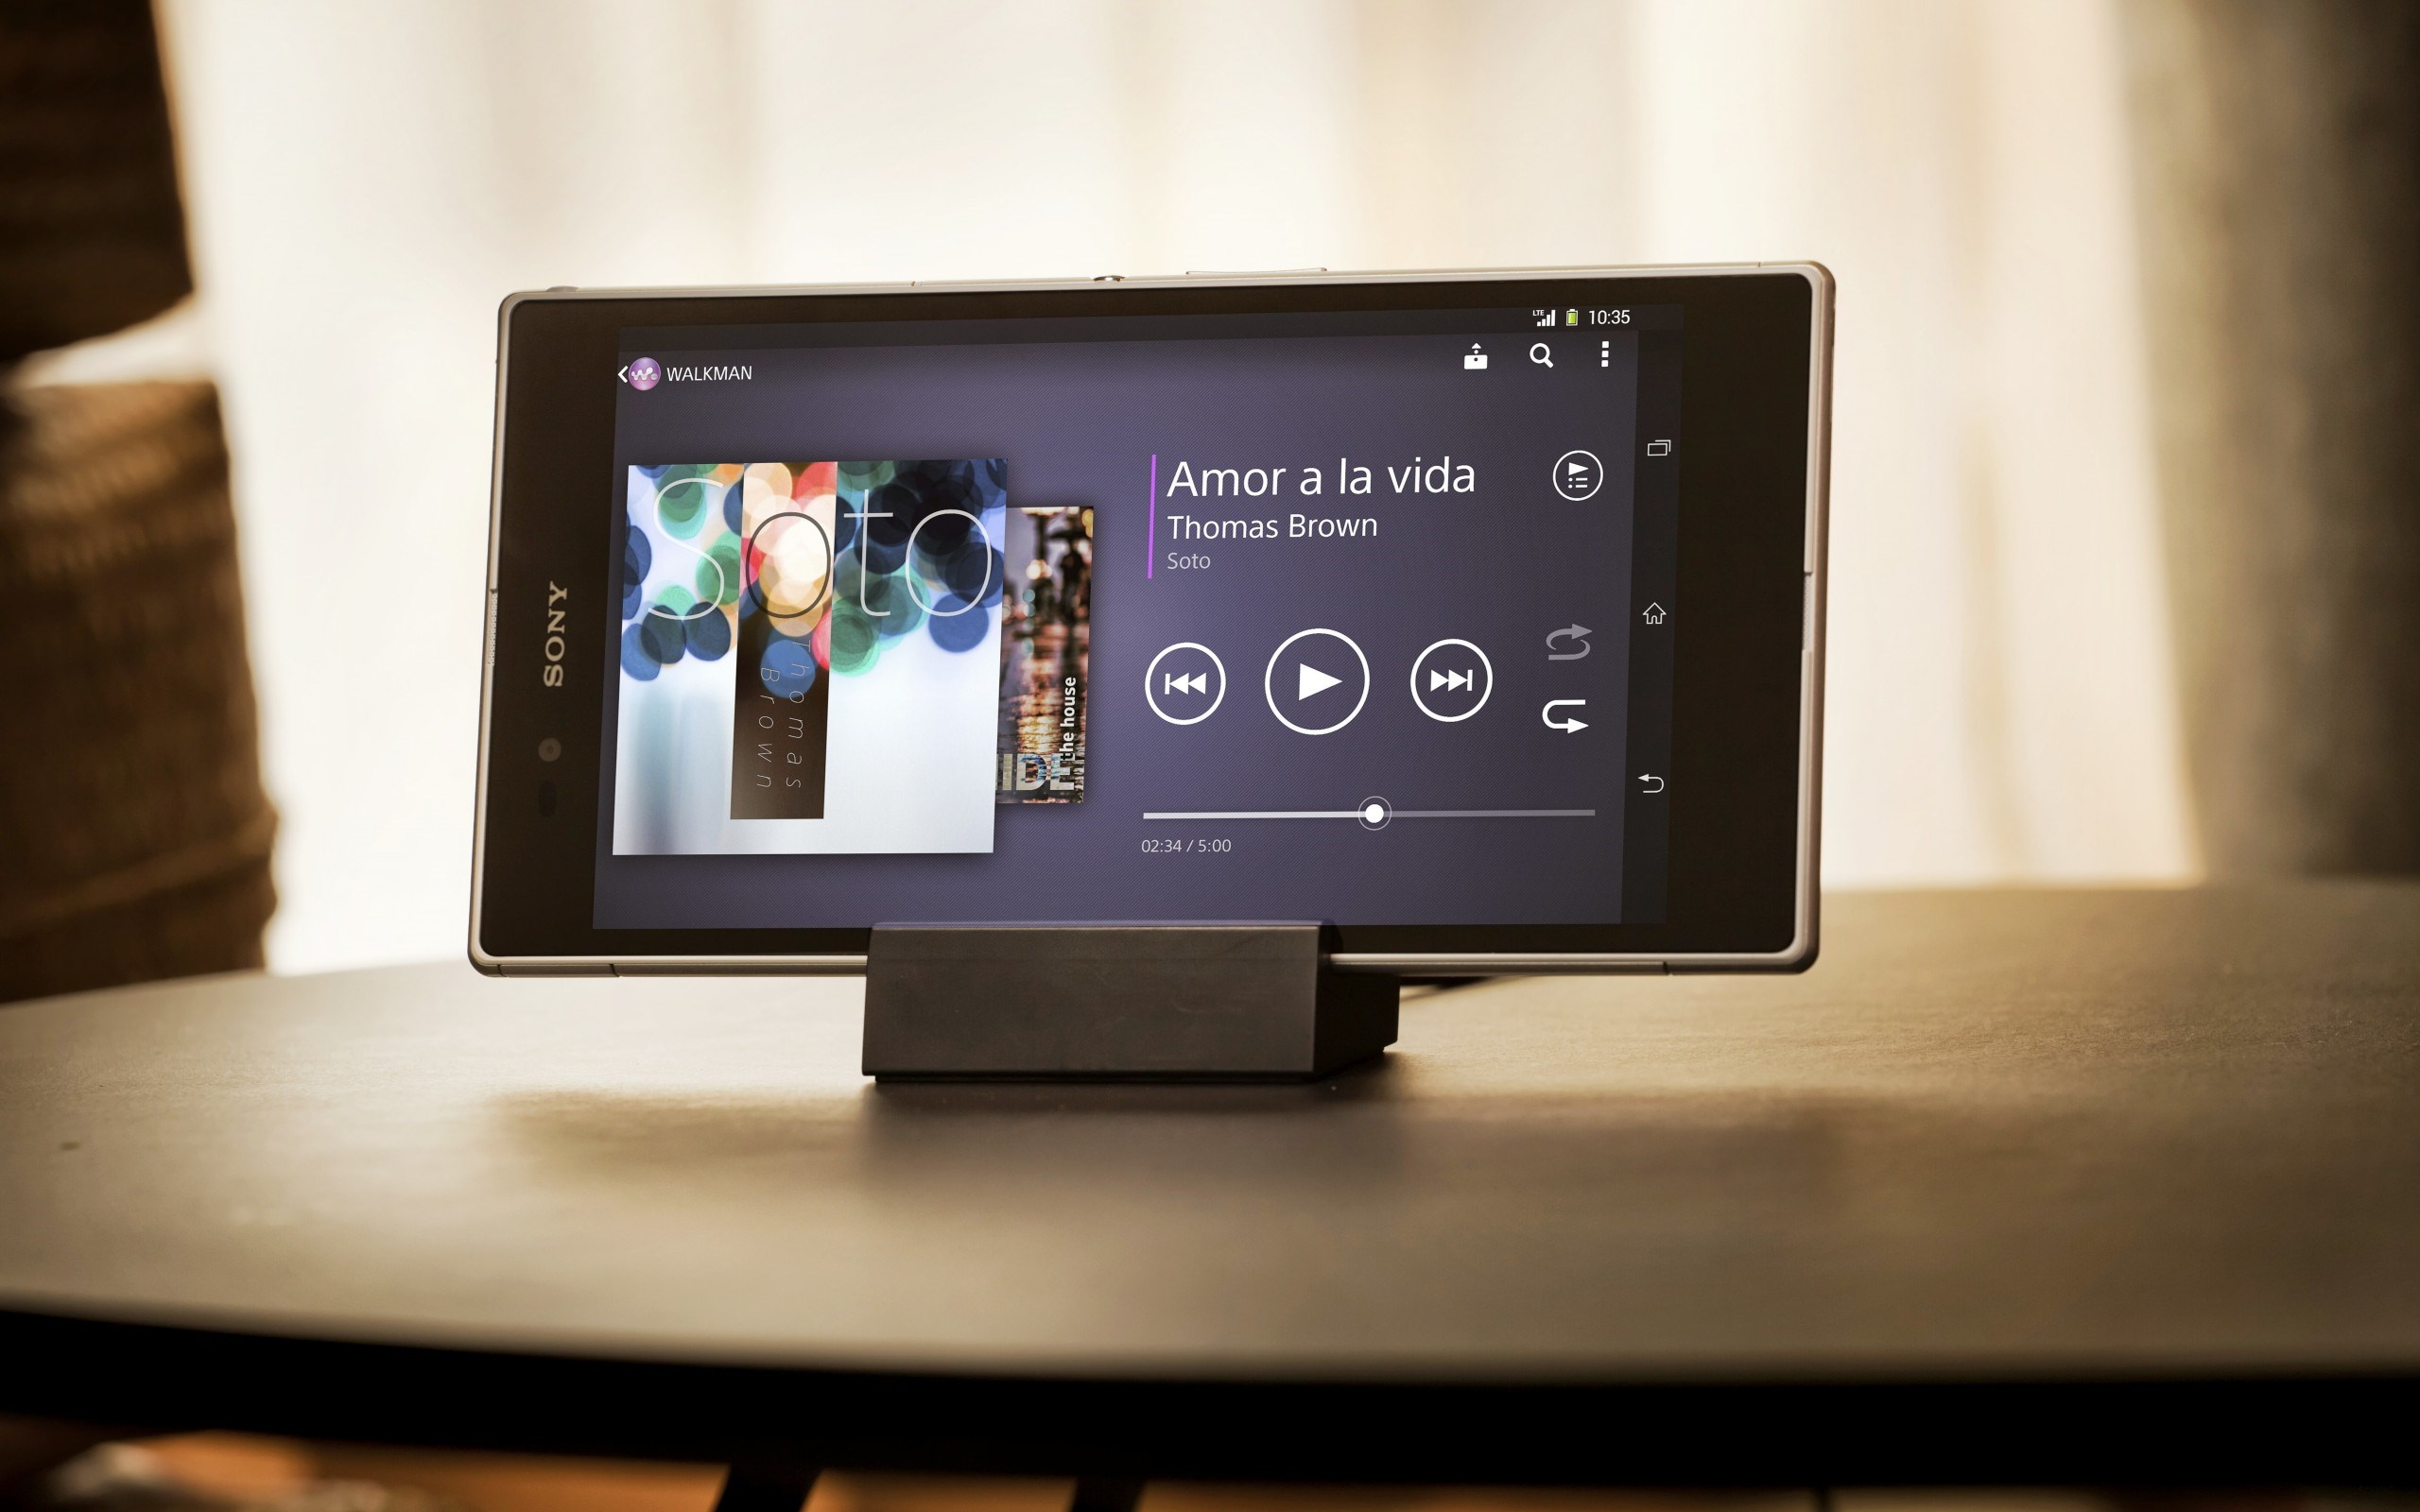 Sony Xperia Z Ultra Hi-Tech